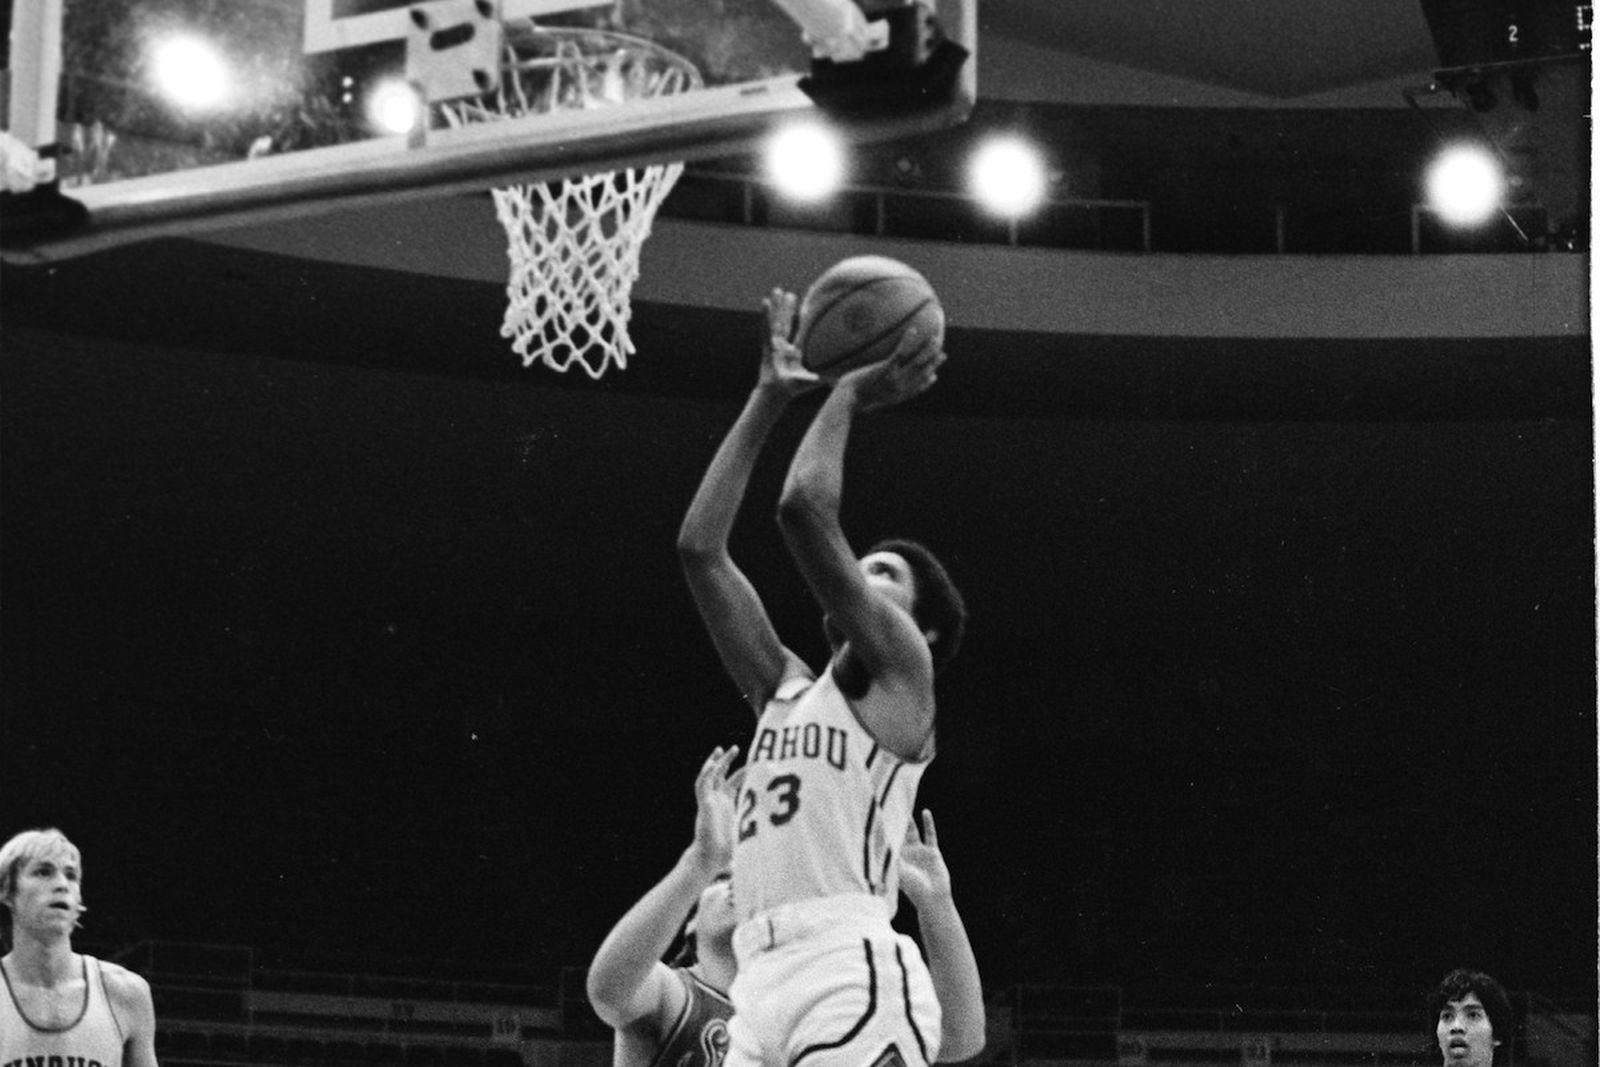 barack obama high school basketball jersey auction Old Town Road Robert De Niro The Irishman